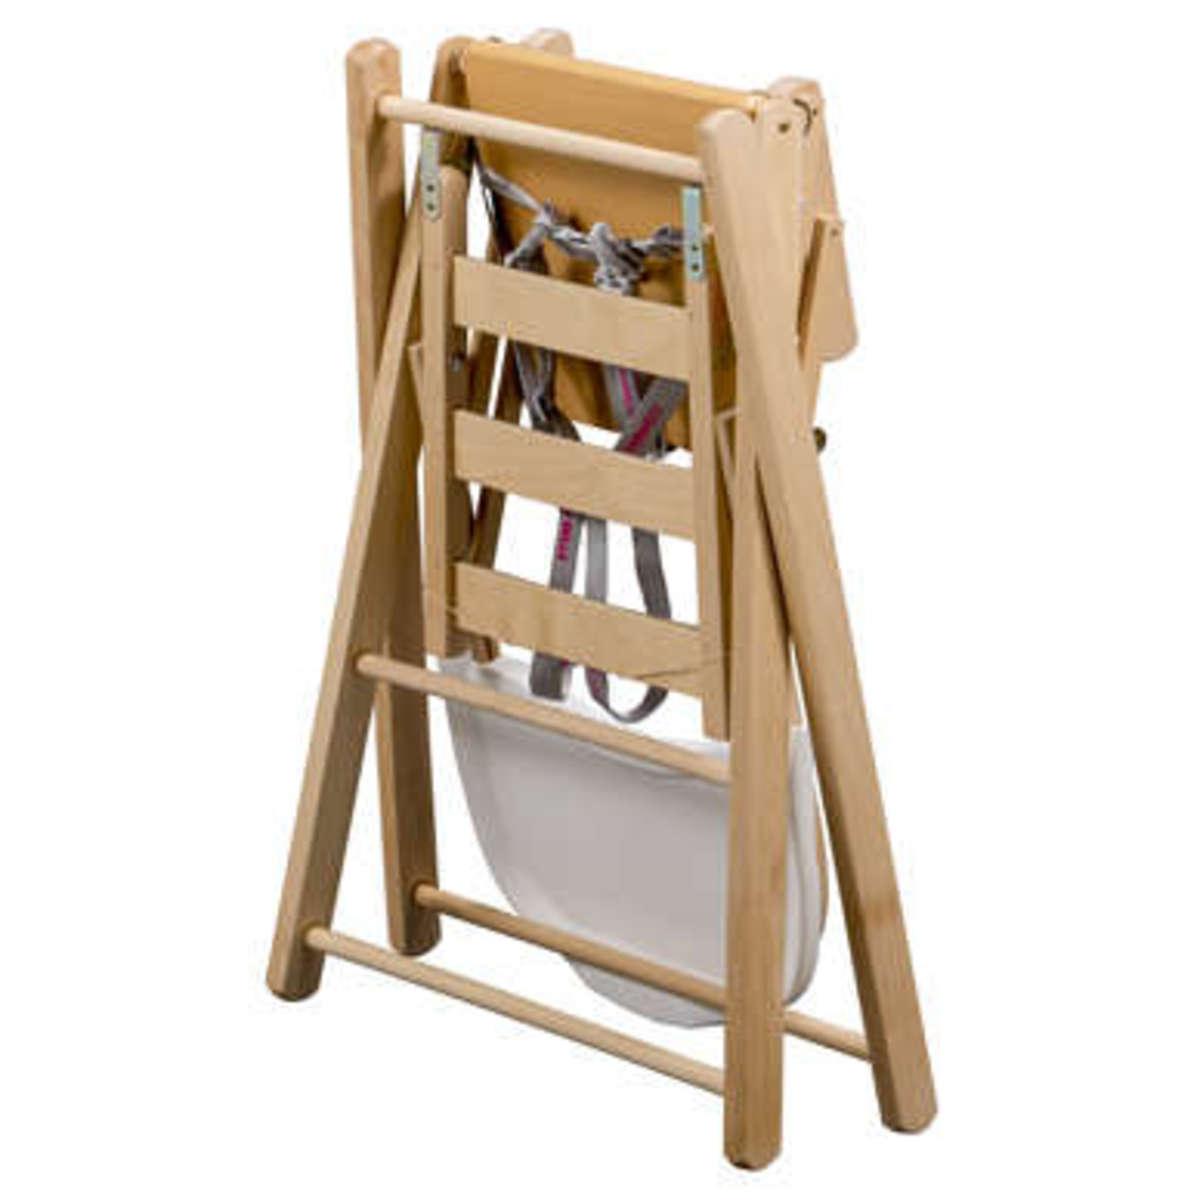 combelle chaise haute extra pliante sarah chaise haute. Black Bedroom Furniture Sets. Home Design Ideas